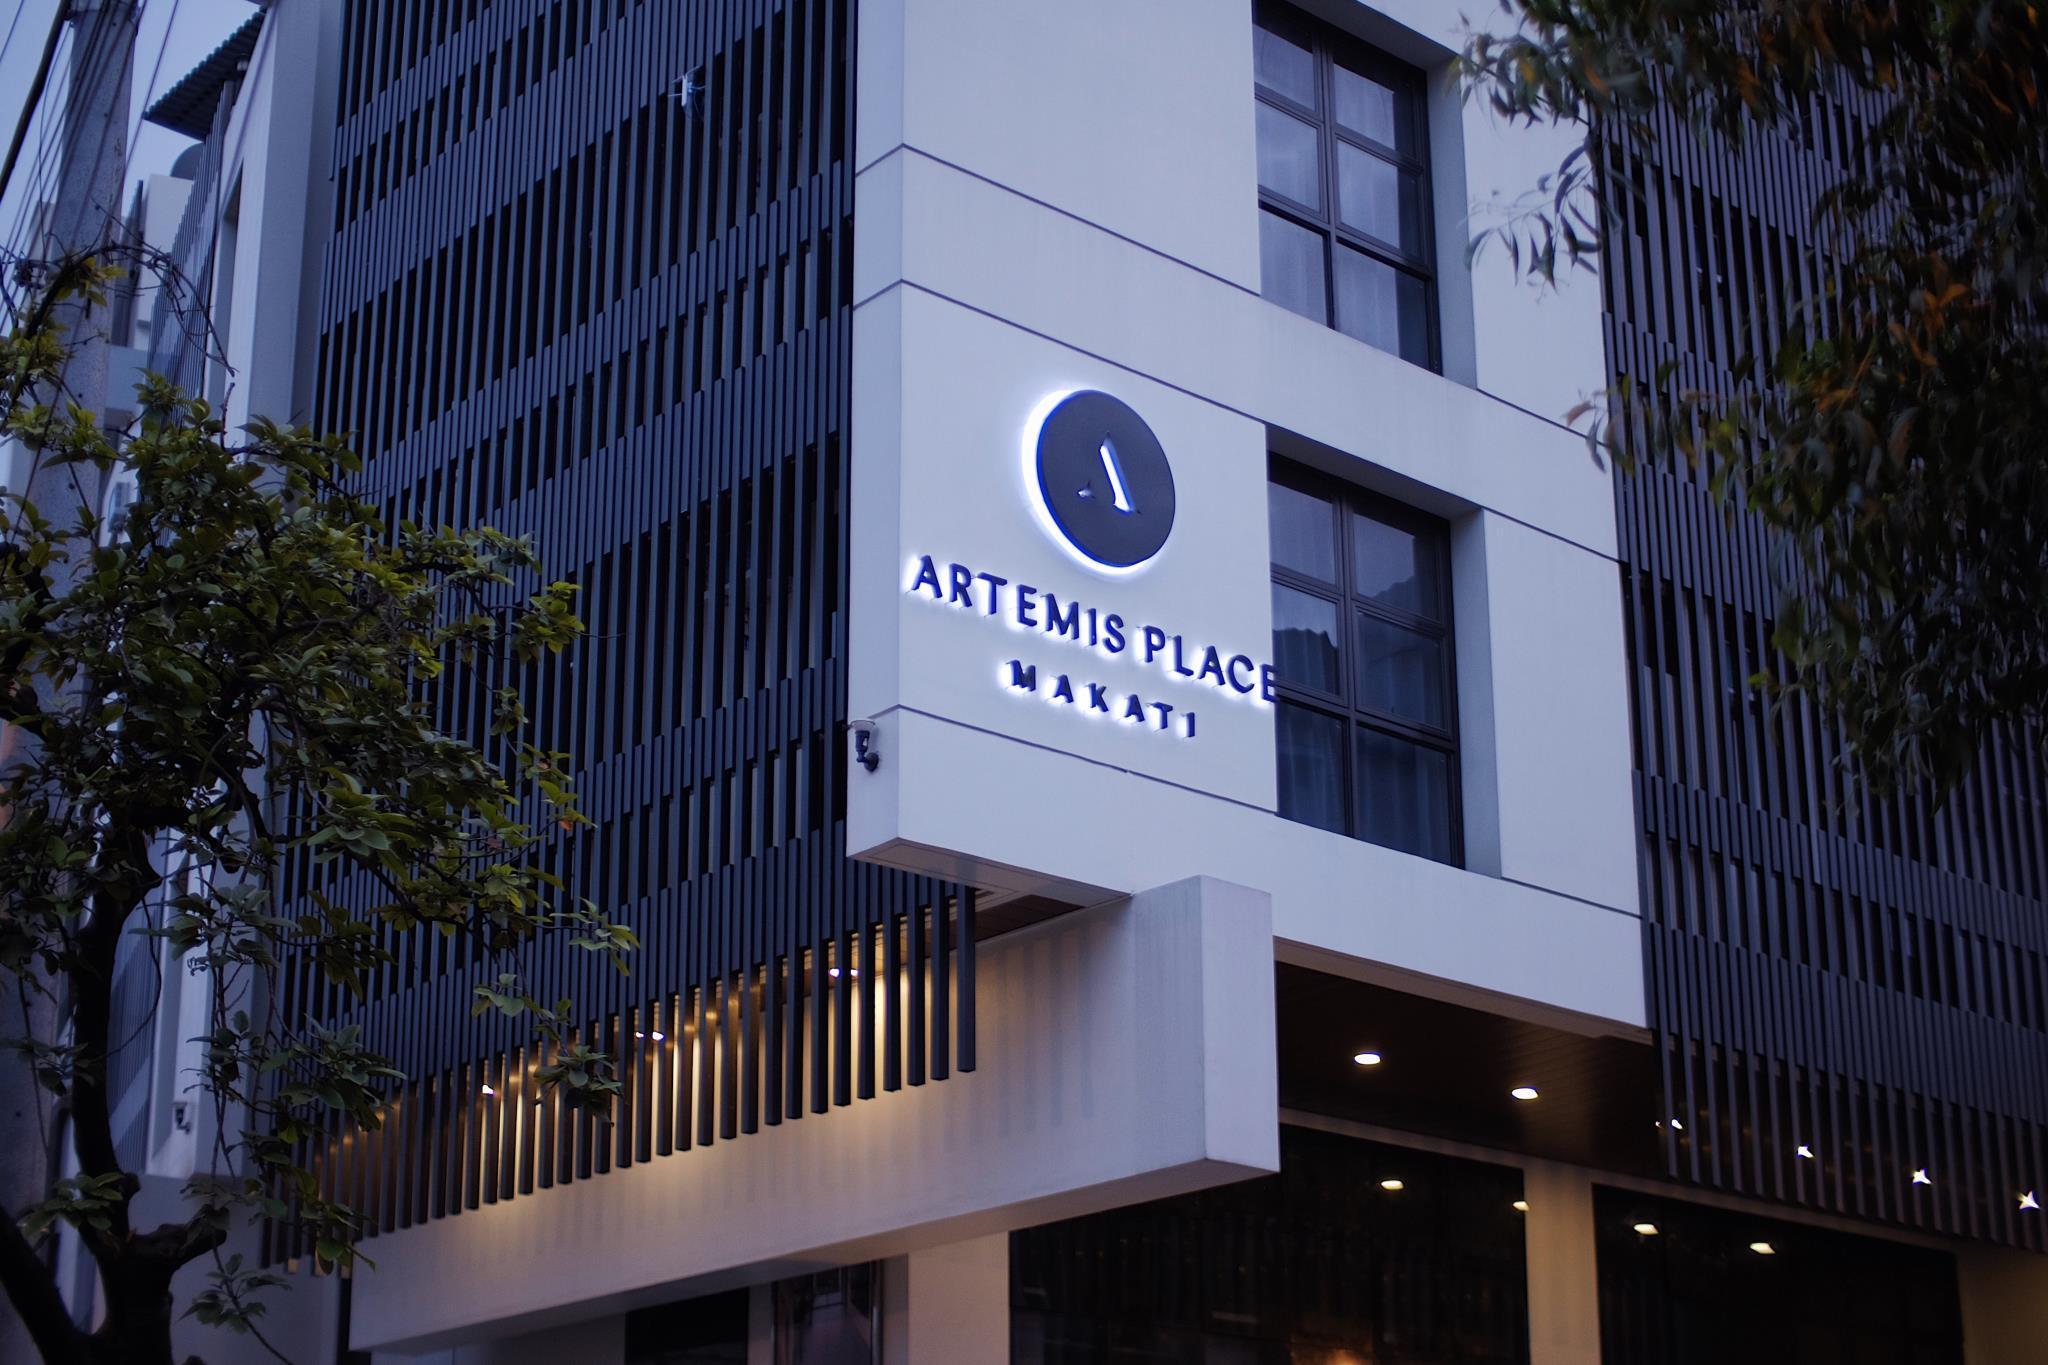 Artemis Place Makati Hotel